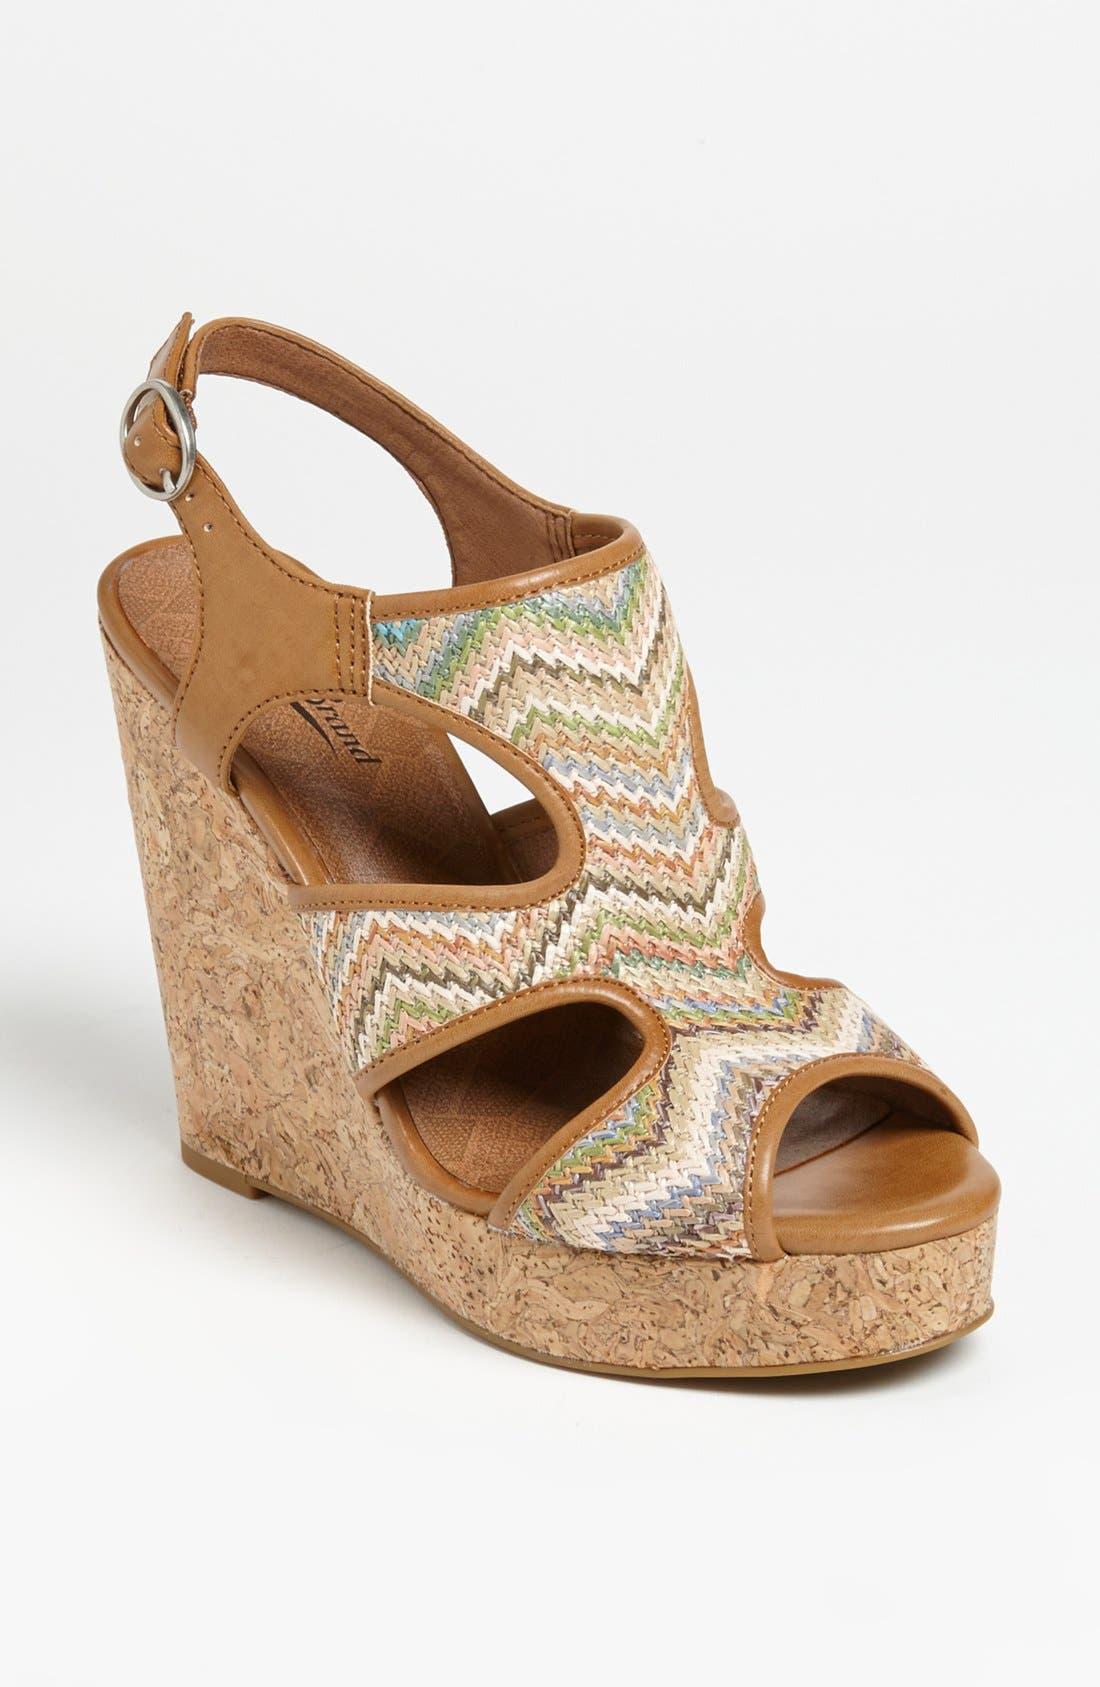 Alternate Image 1 Selected - Lucky Brand 'Riedel' Wedge Sandal